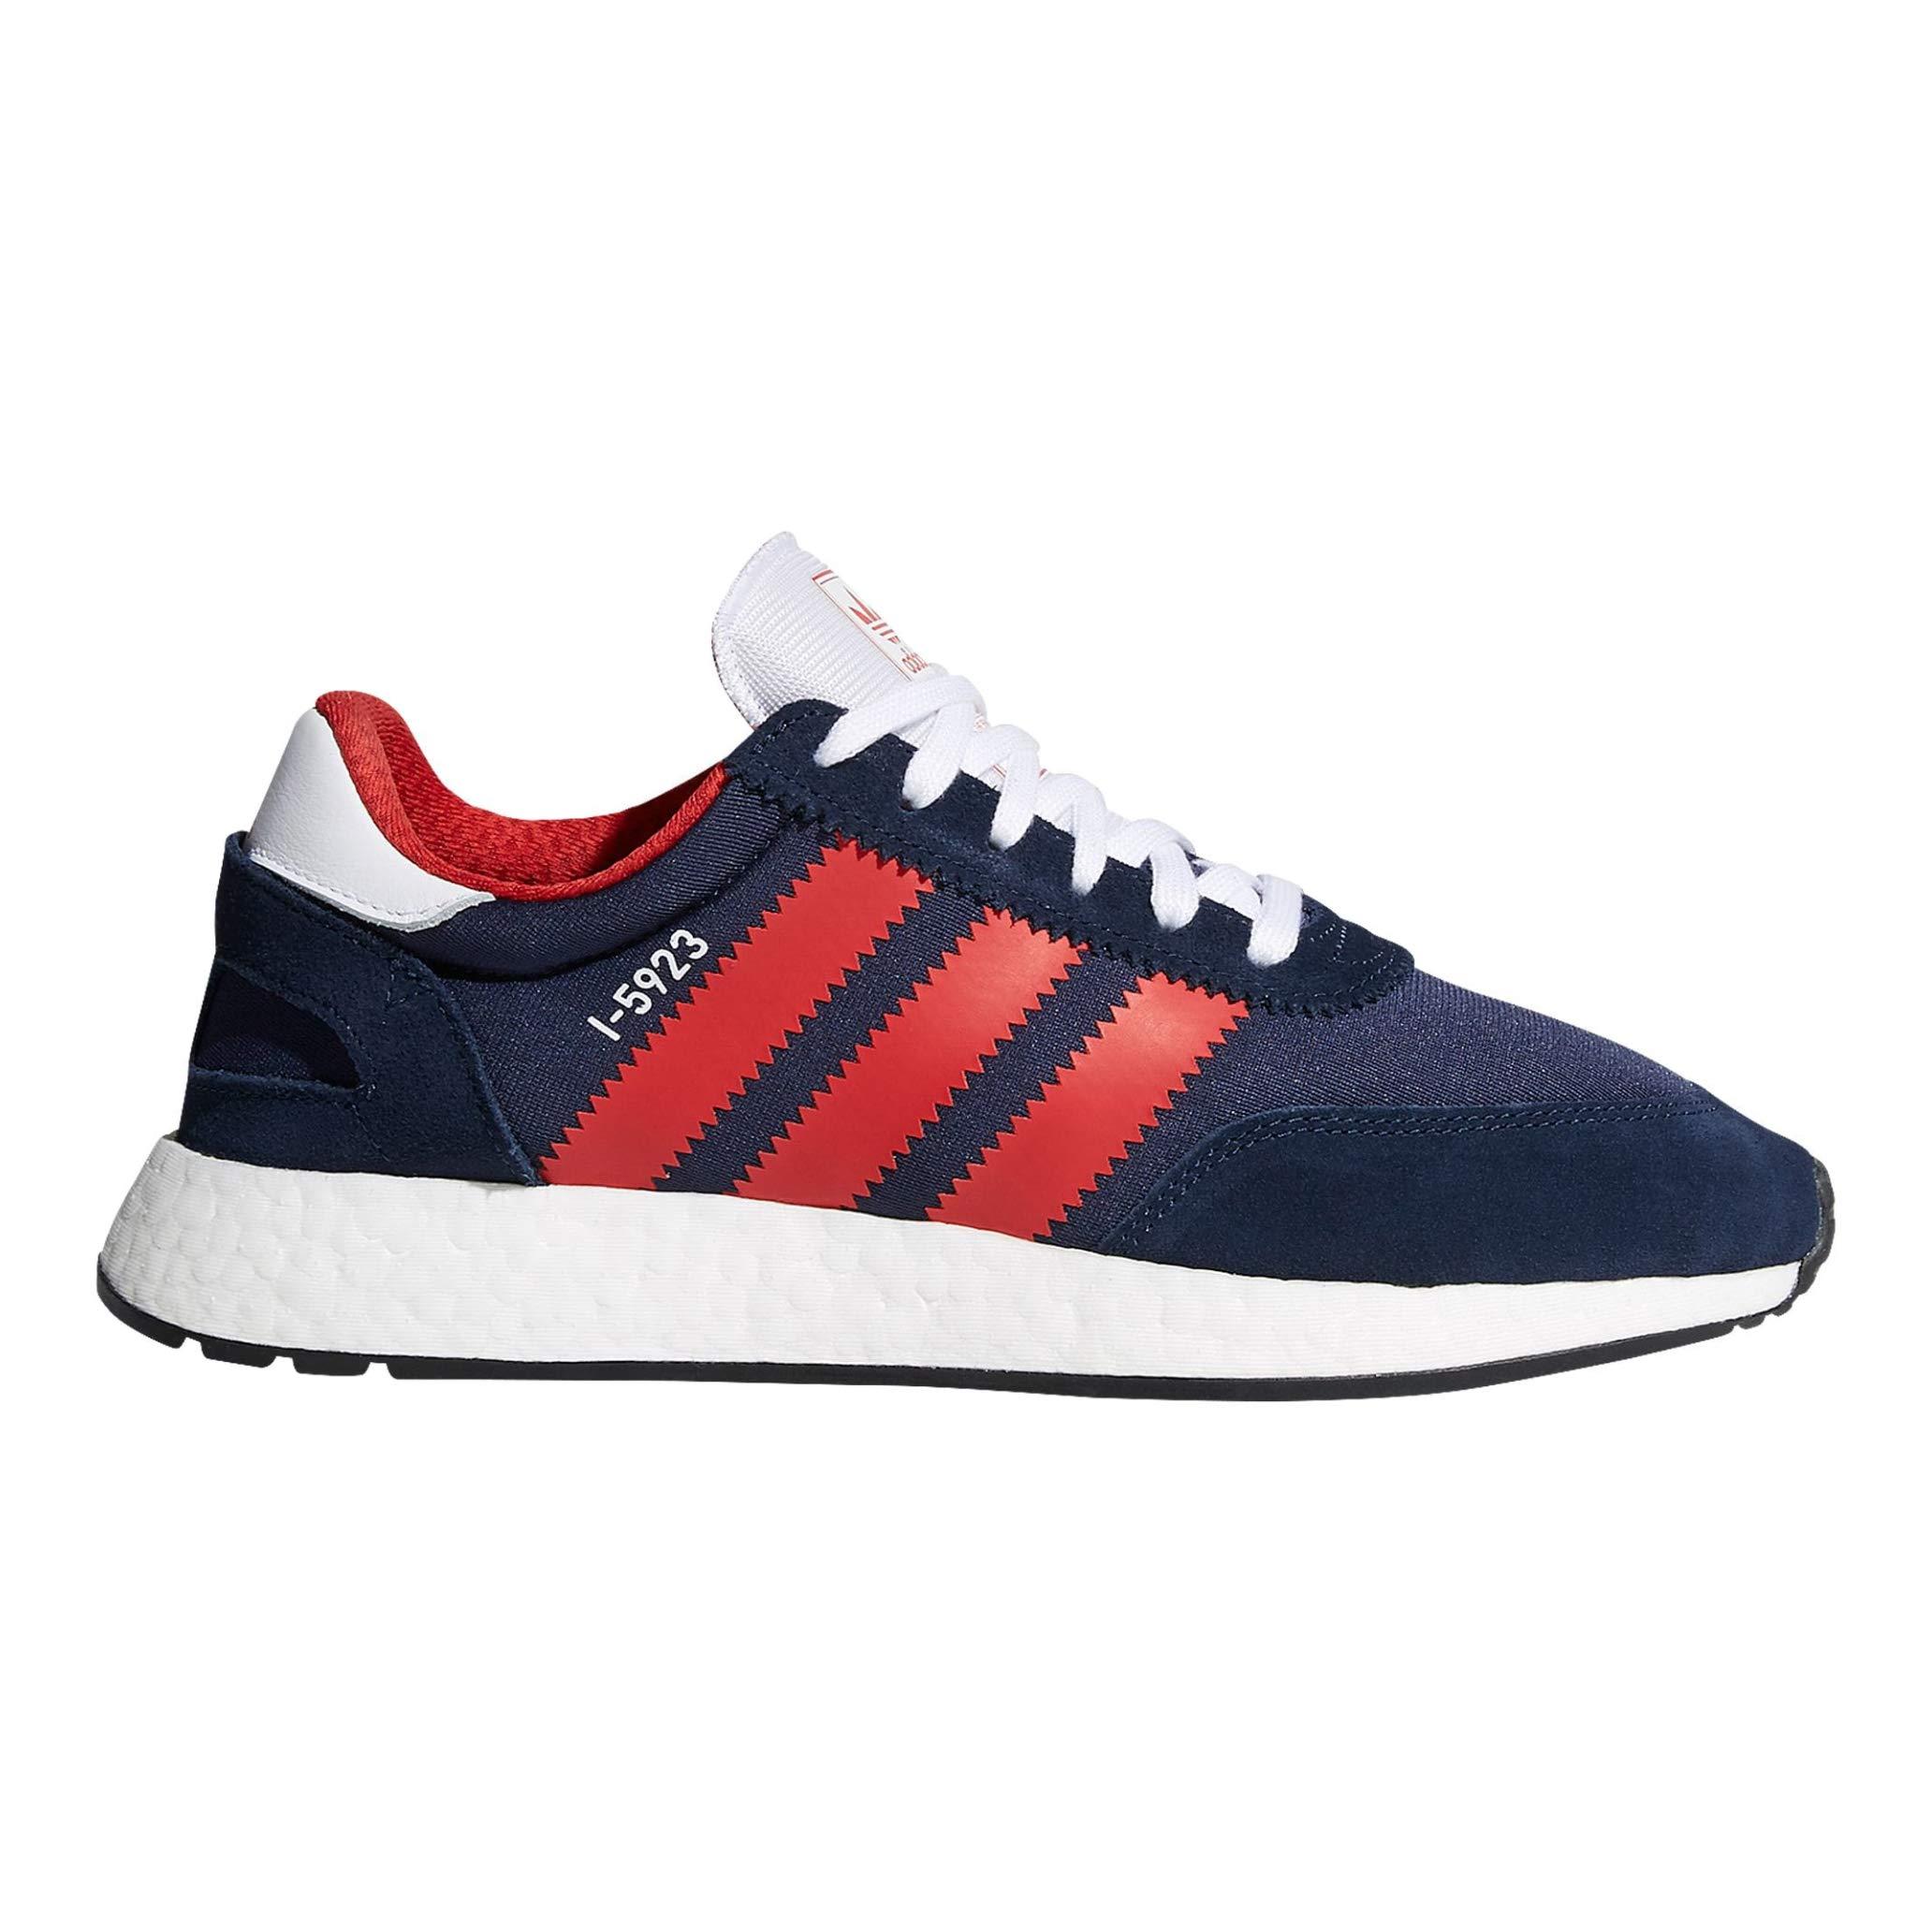 adidas Originals I 5923 Shoe Men's Casual 10 Collegiate NavyRedWhite